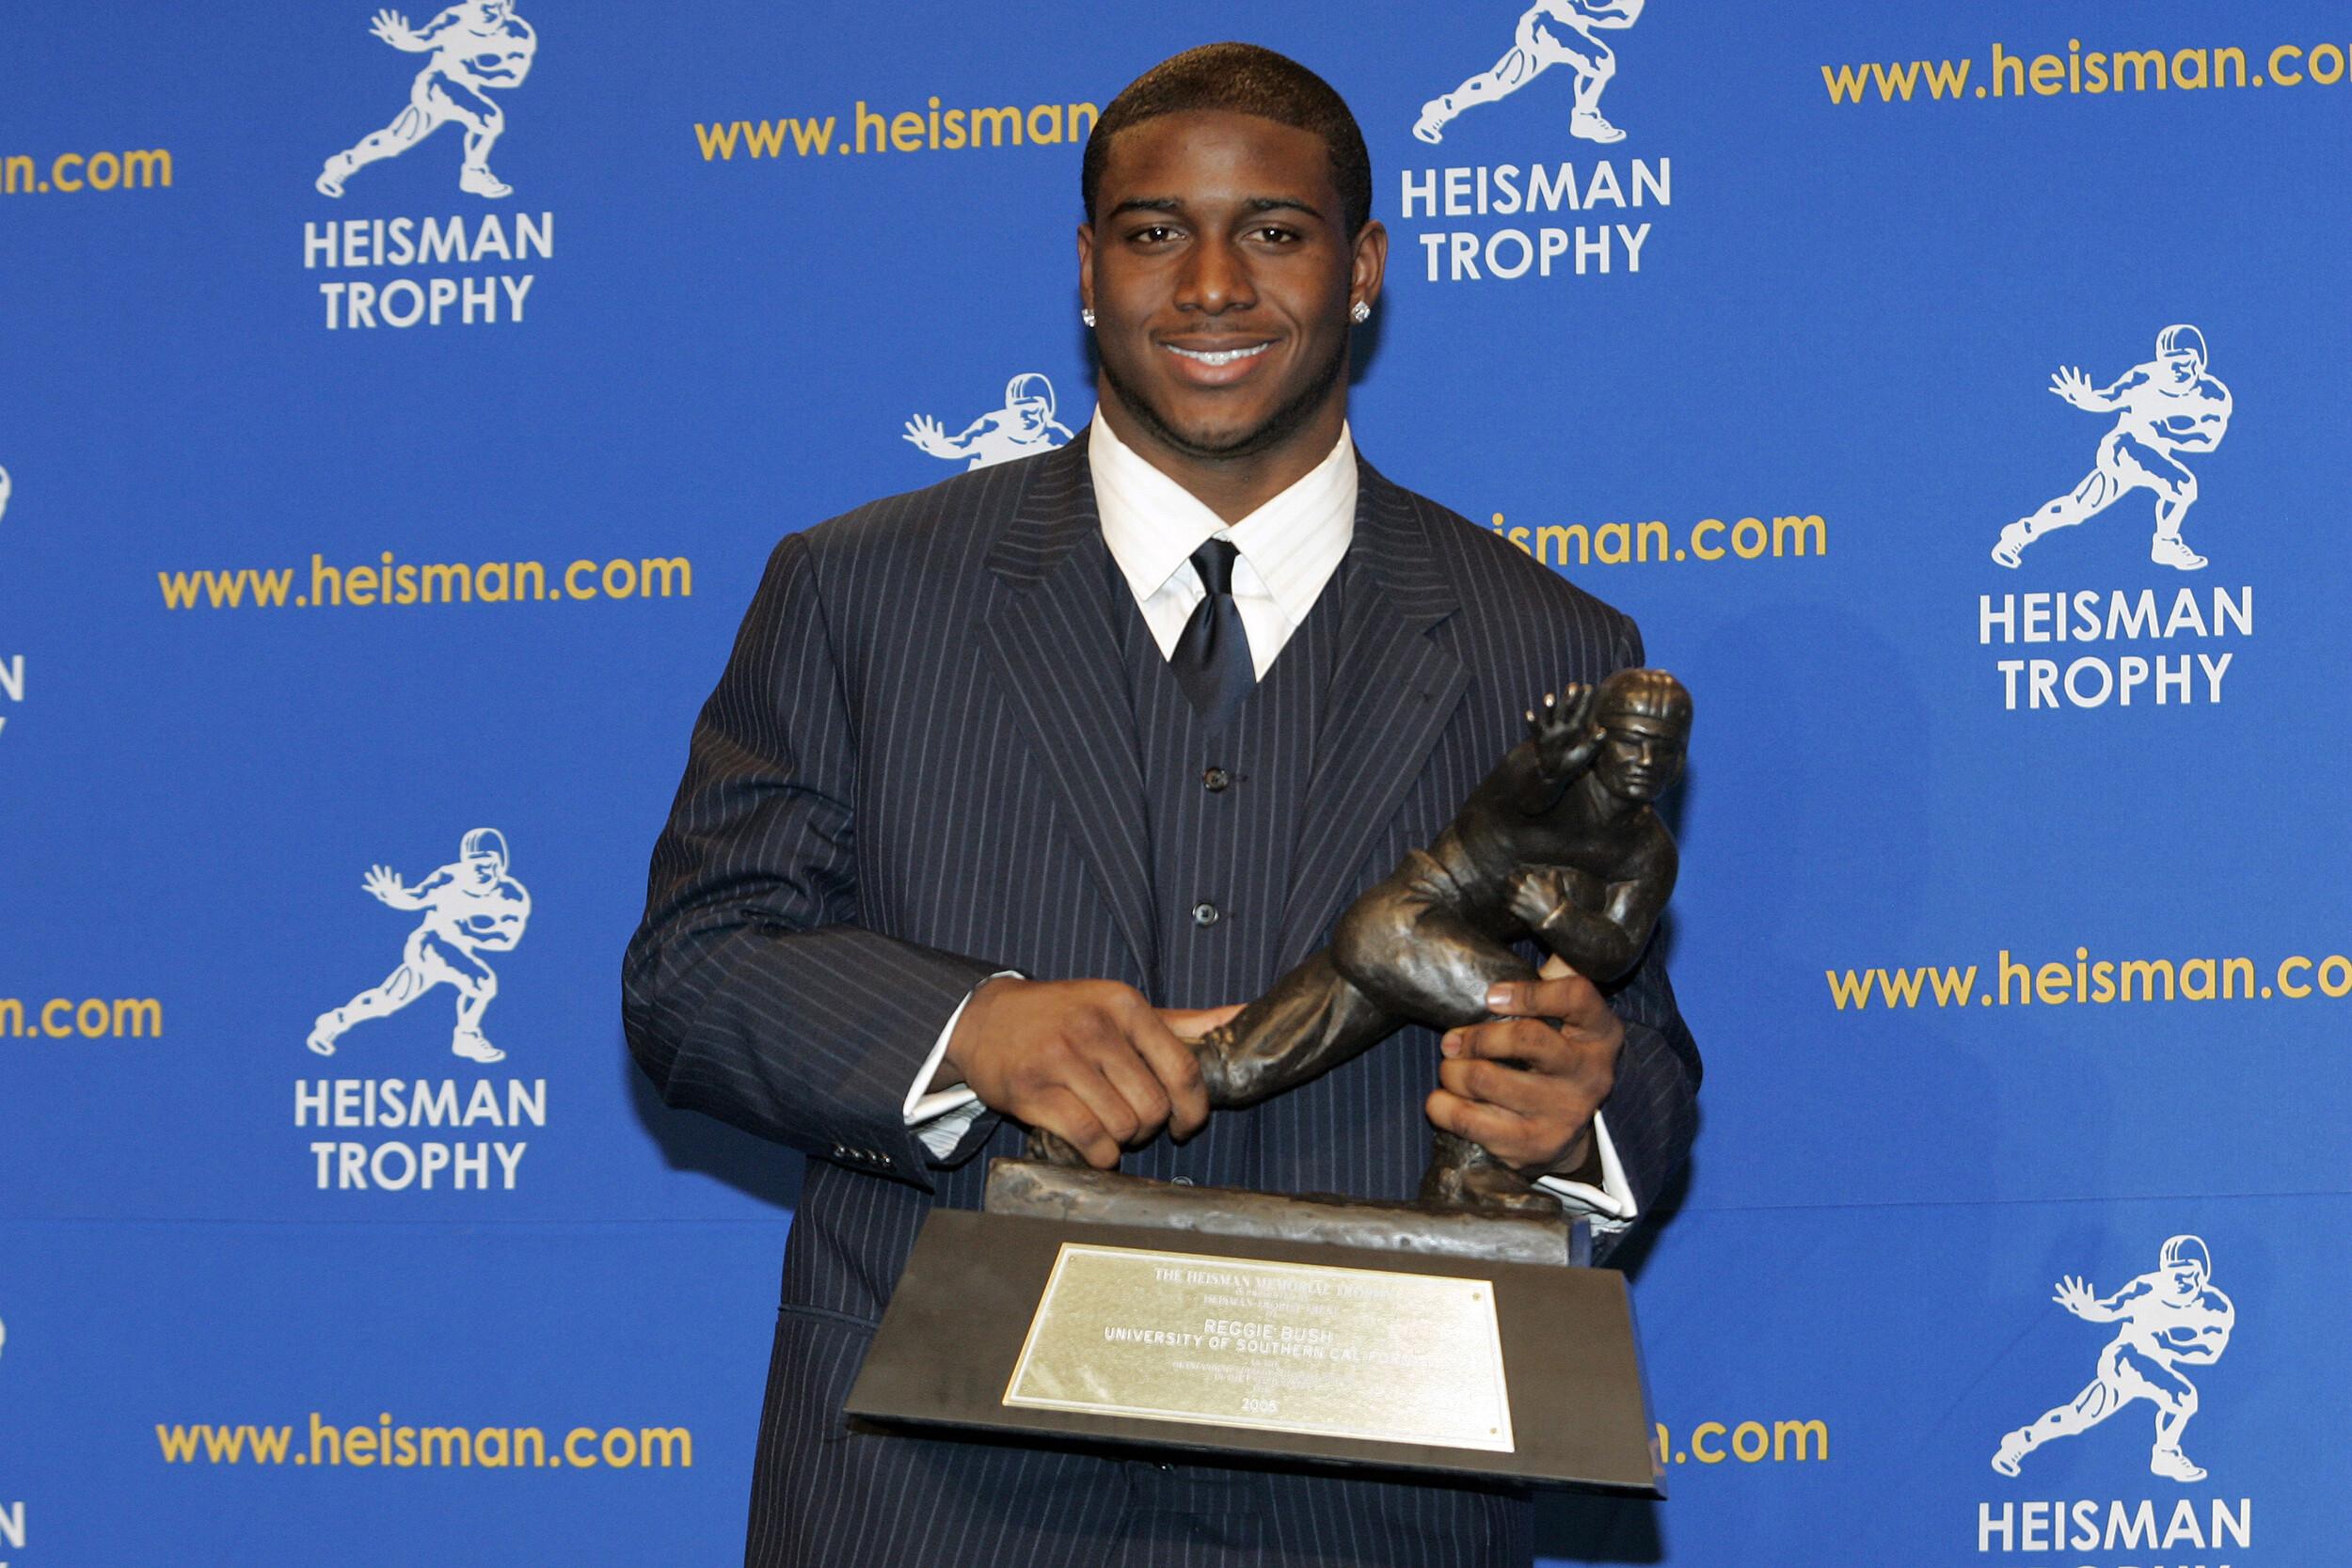 NCAA stance means Reggie Bush won't get Heisman Trophy back